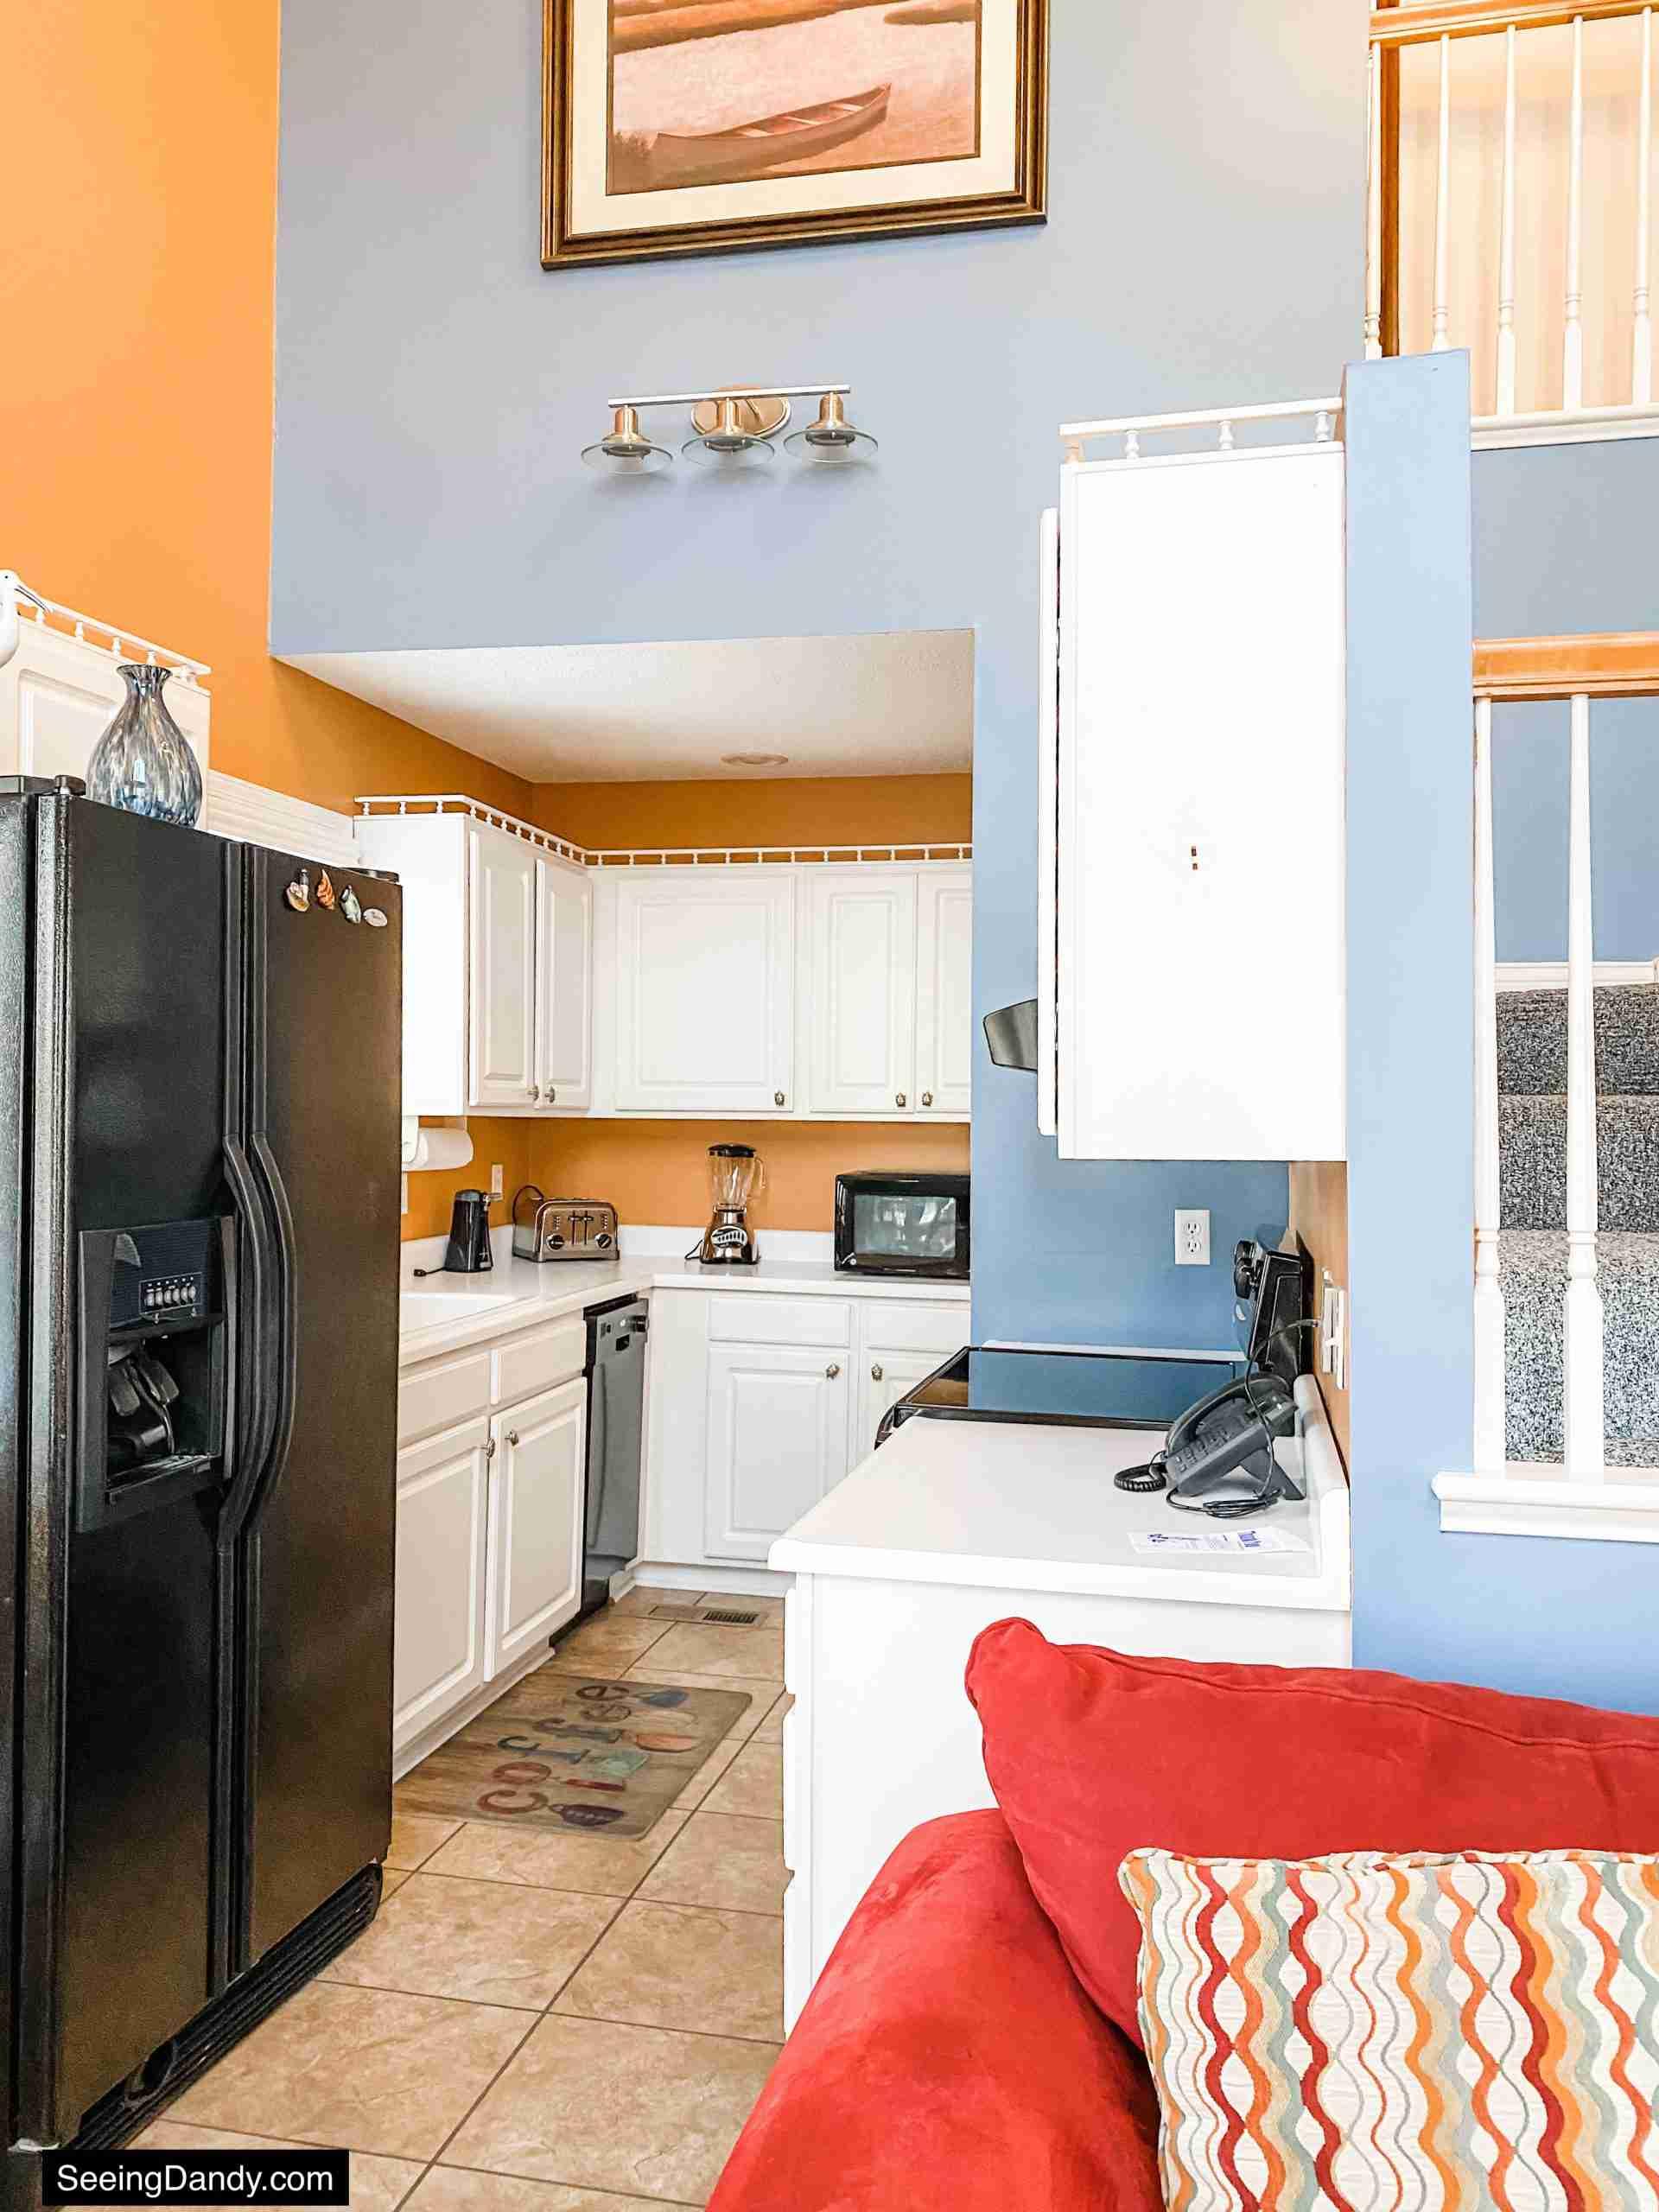 green turtle bay condo, elliebelle condo, nautical decor, galley kitchen, galley kitchen ideas, red sofa